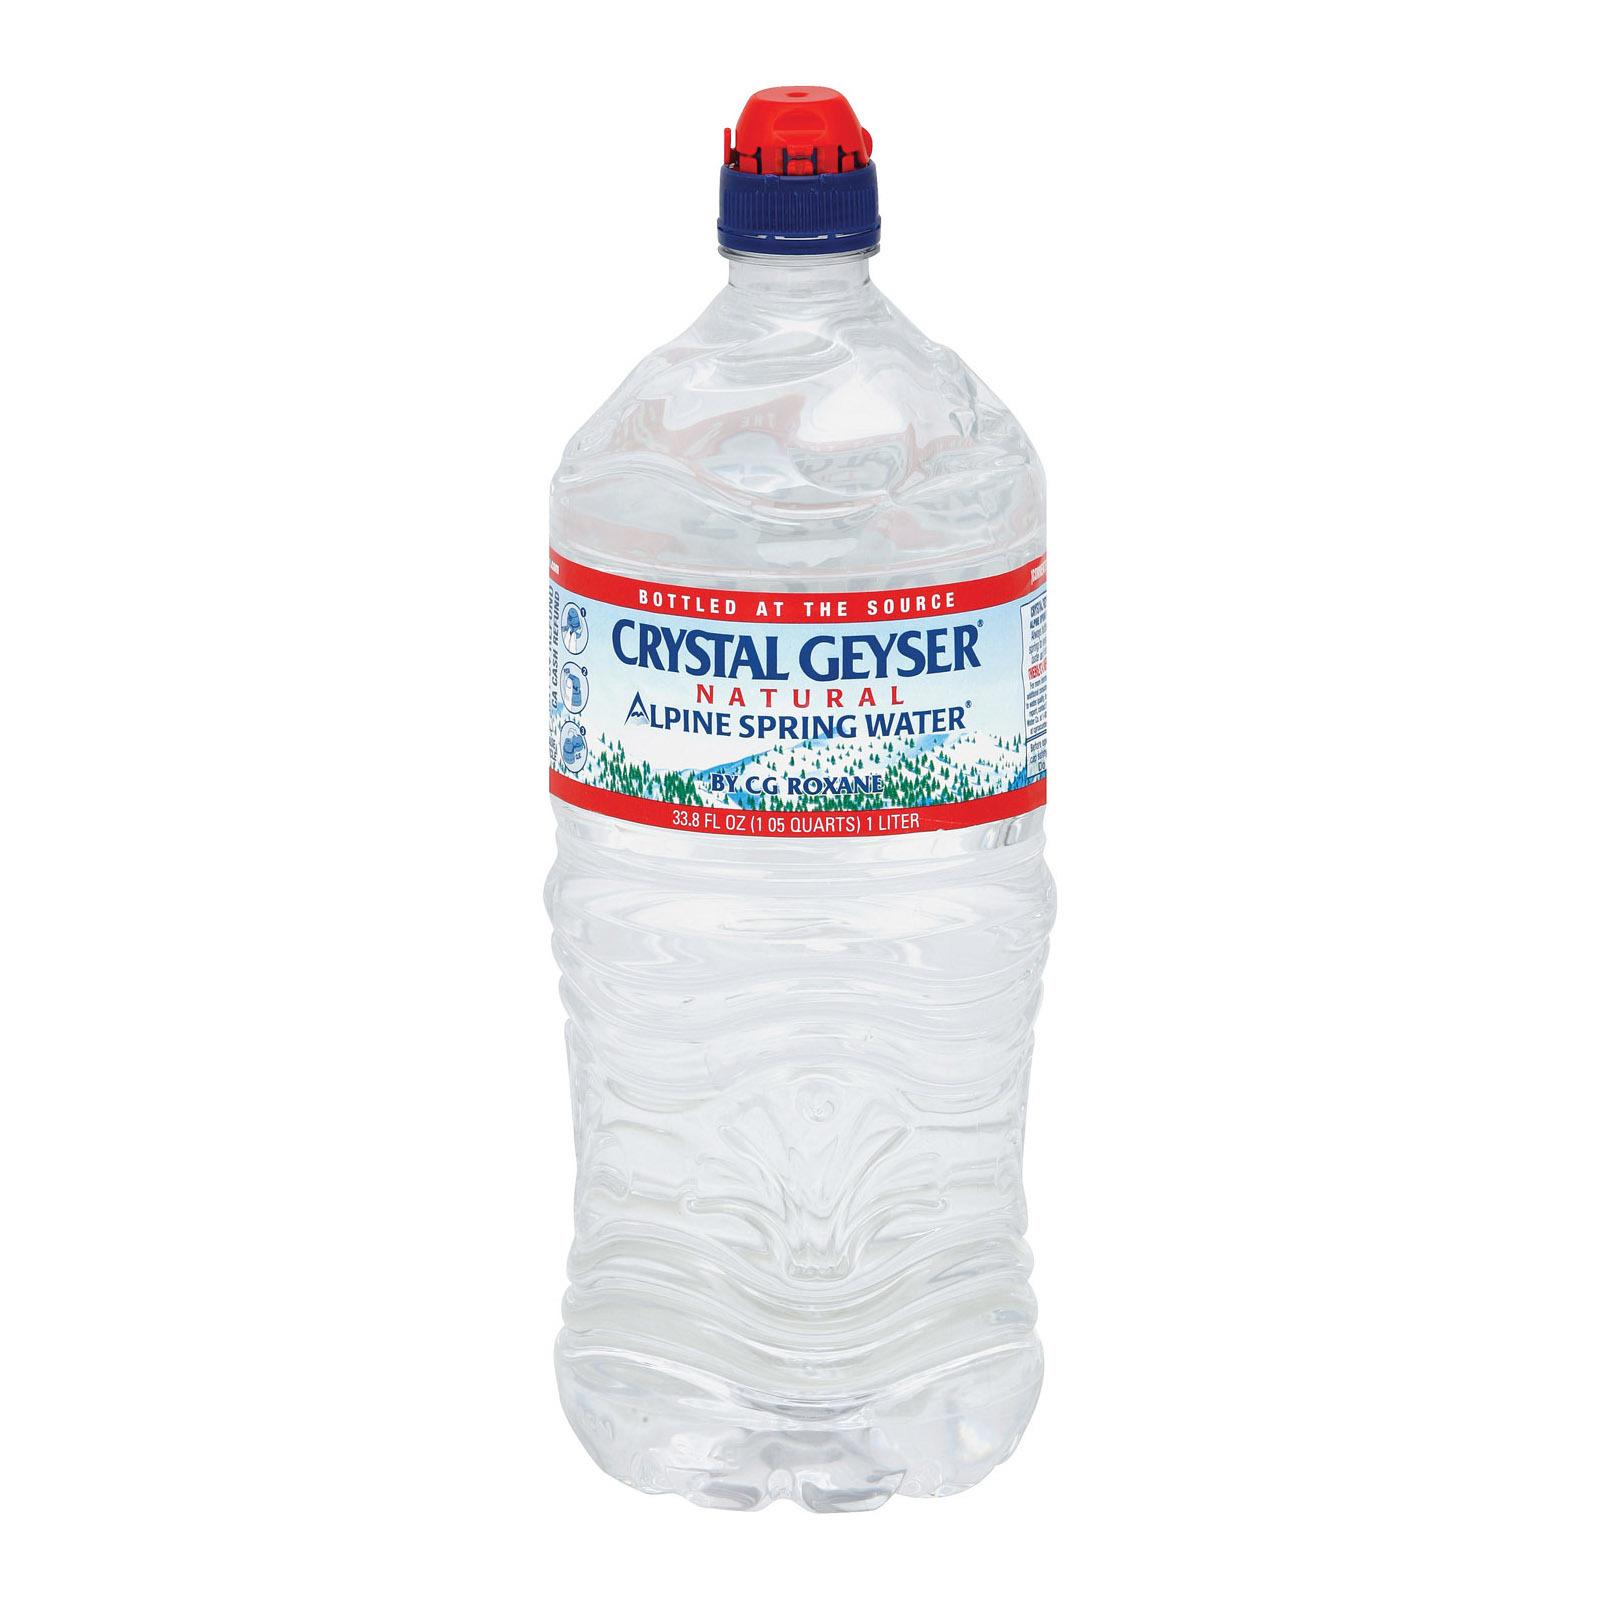 Crystal Geyser Alpine Spring Water - Case of 15 - 33.8 Fl oz.